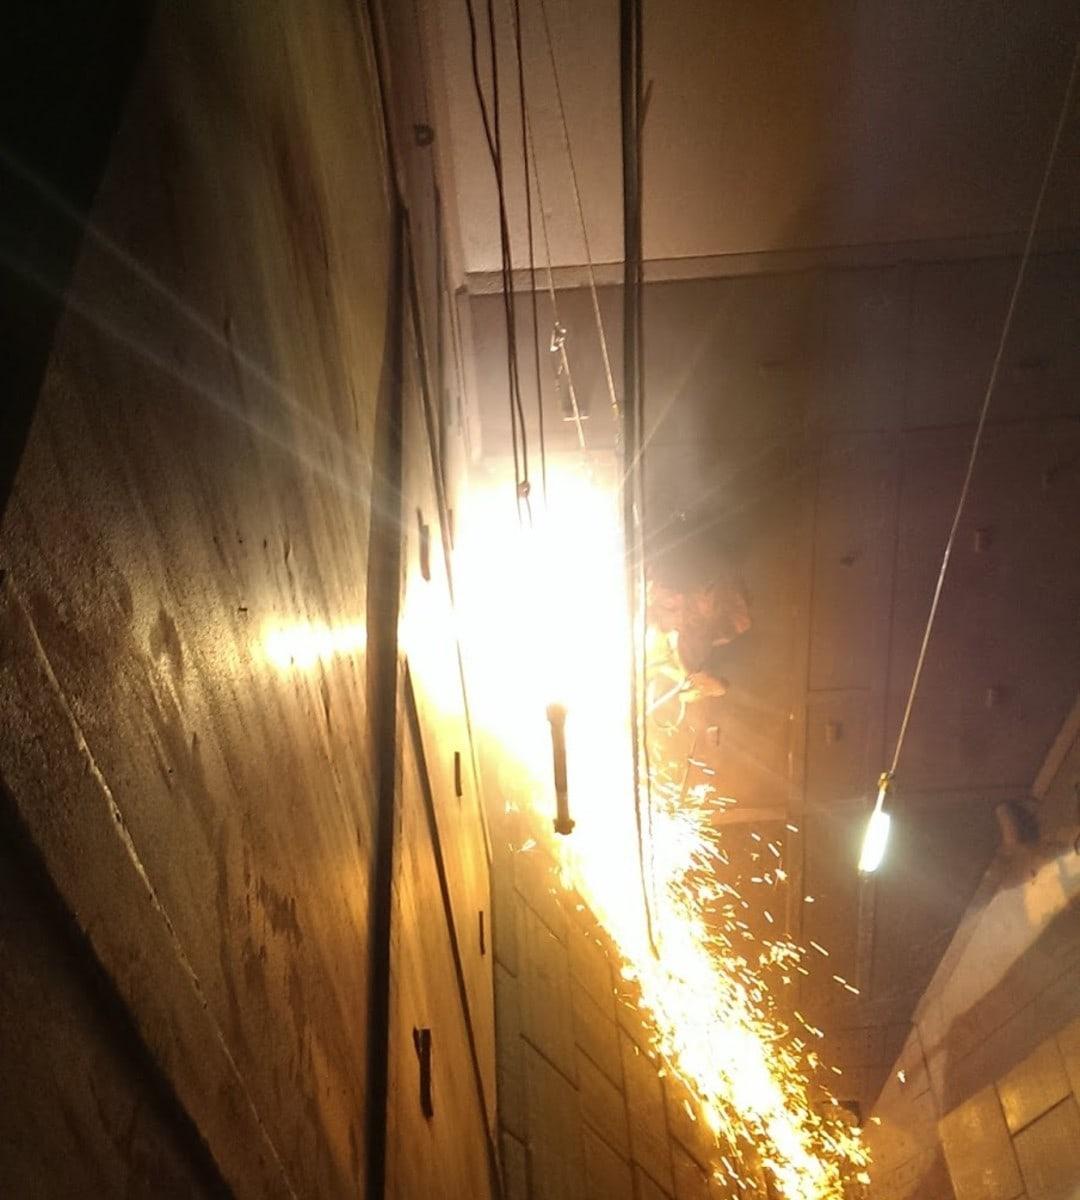 bhp iron ore maintenance wa other services